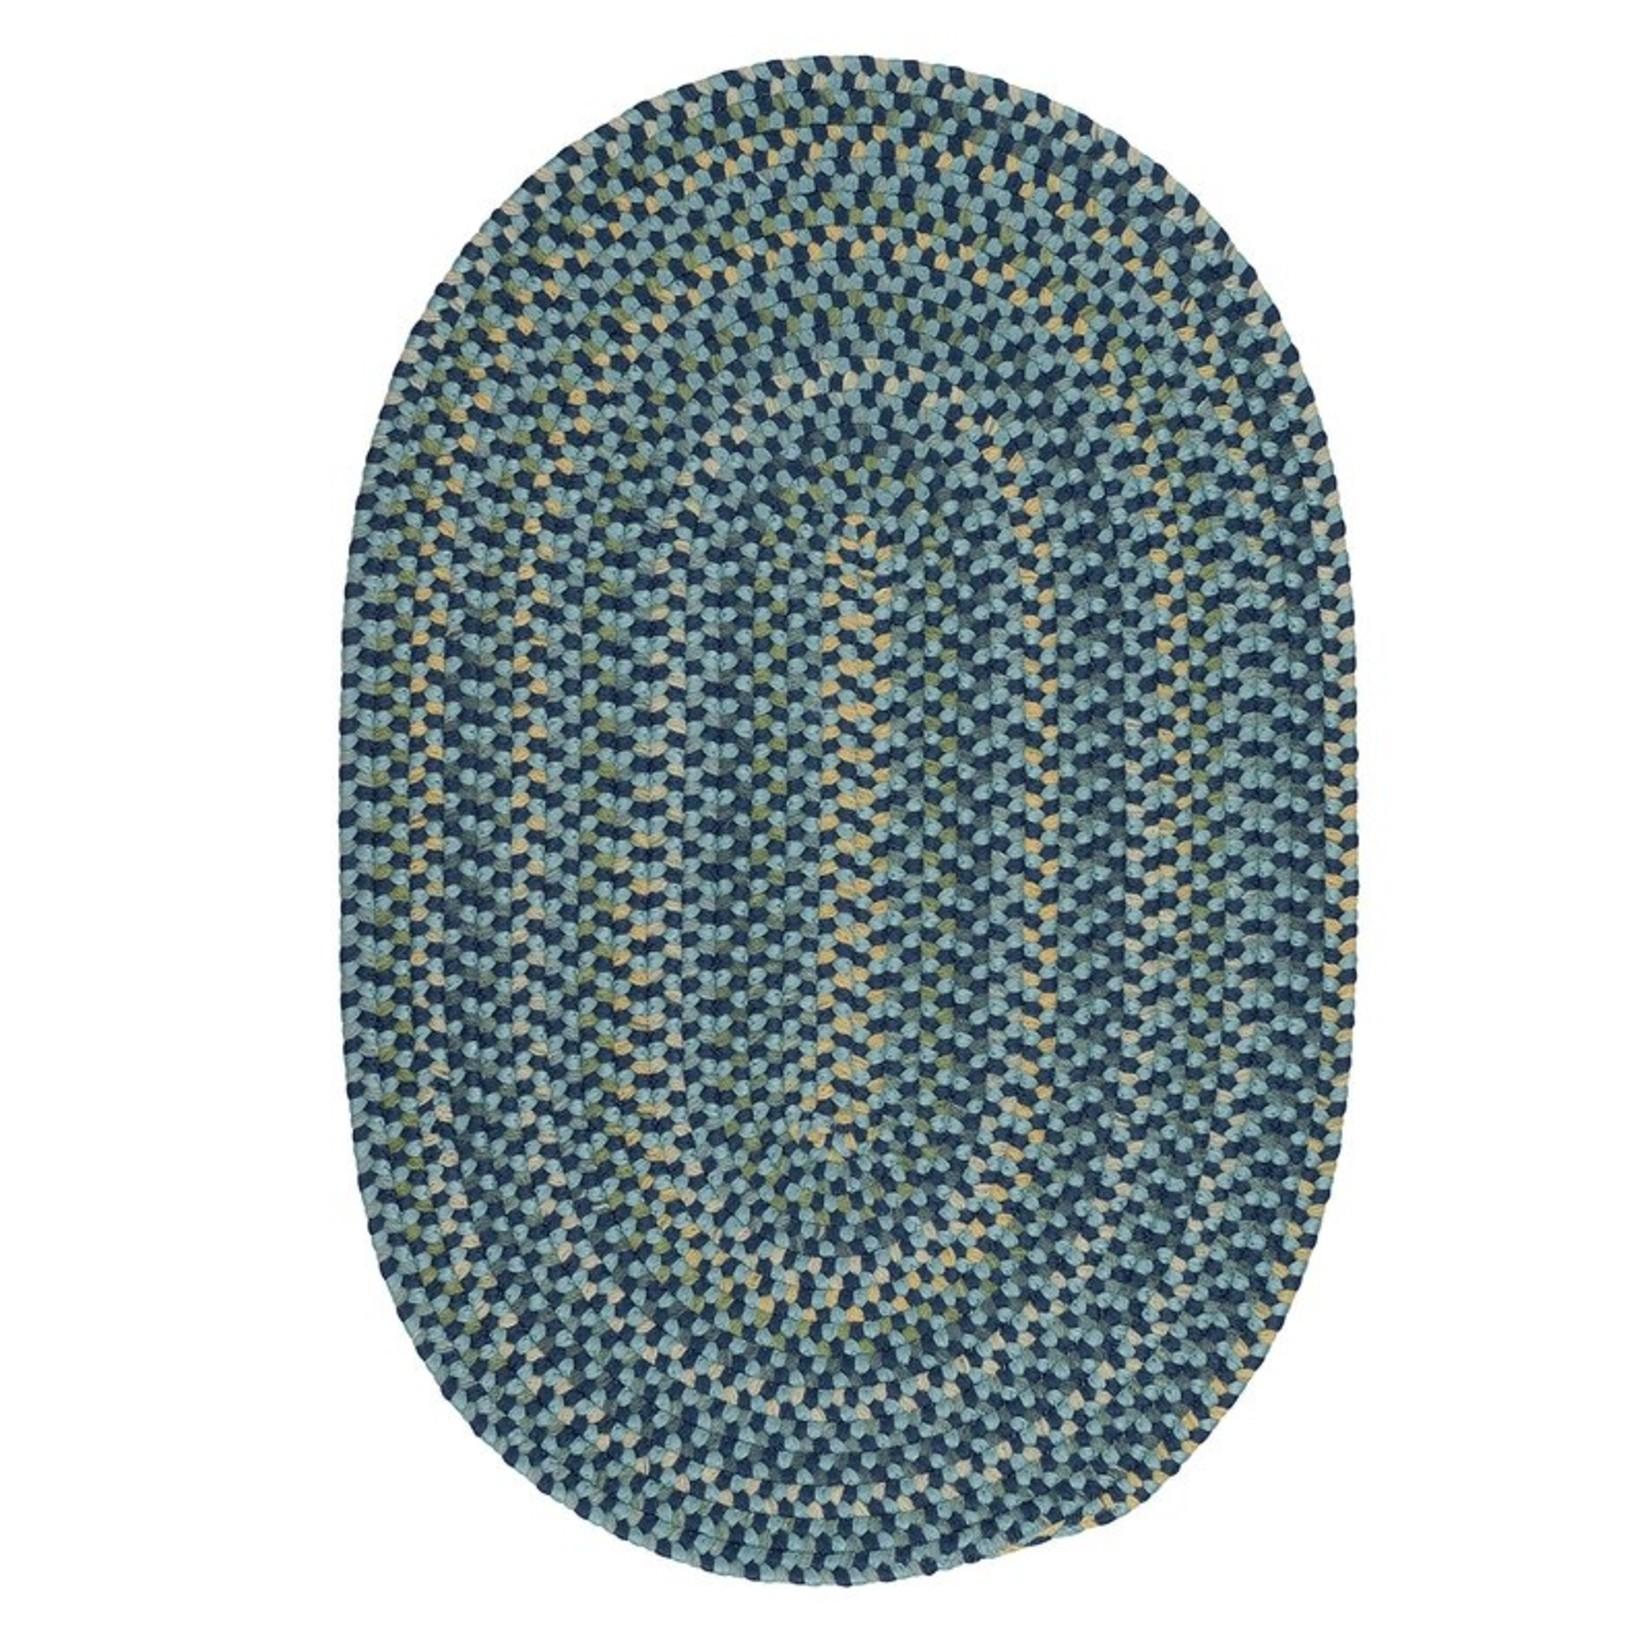 *3' x 5' Oval - Glafira Braided Blue Rug